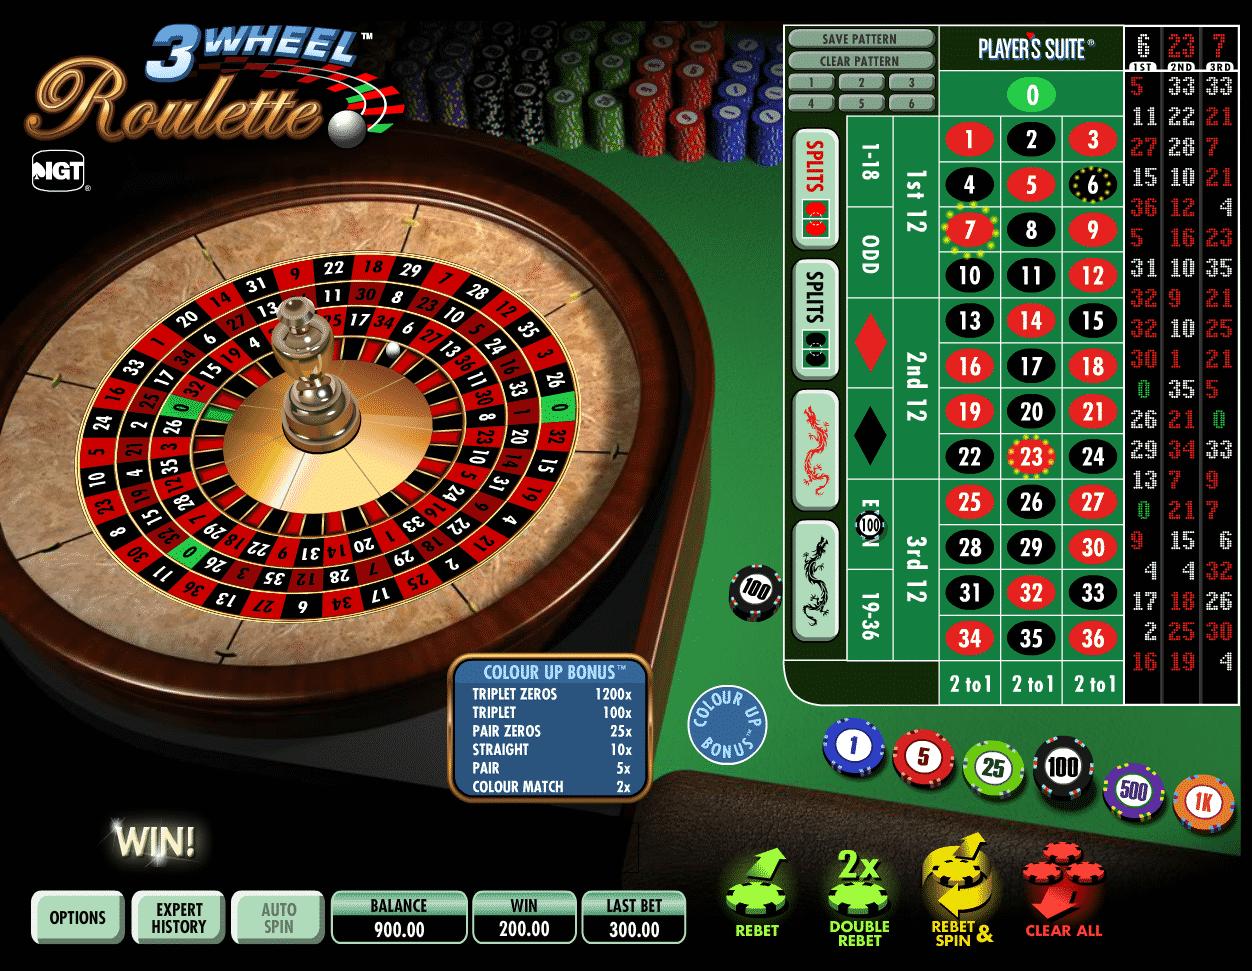 Hard Rock Casino roulette